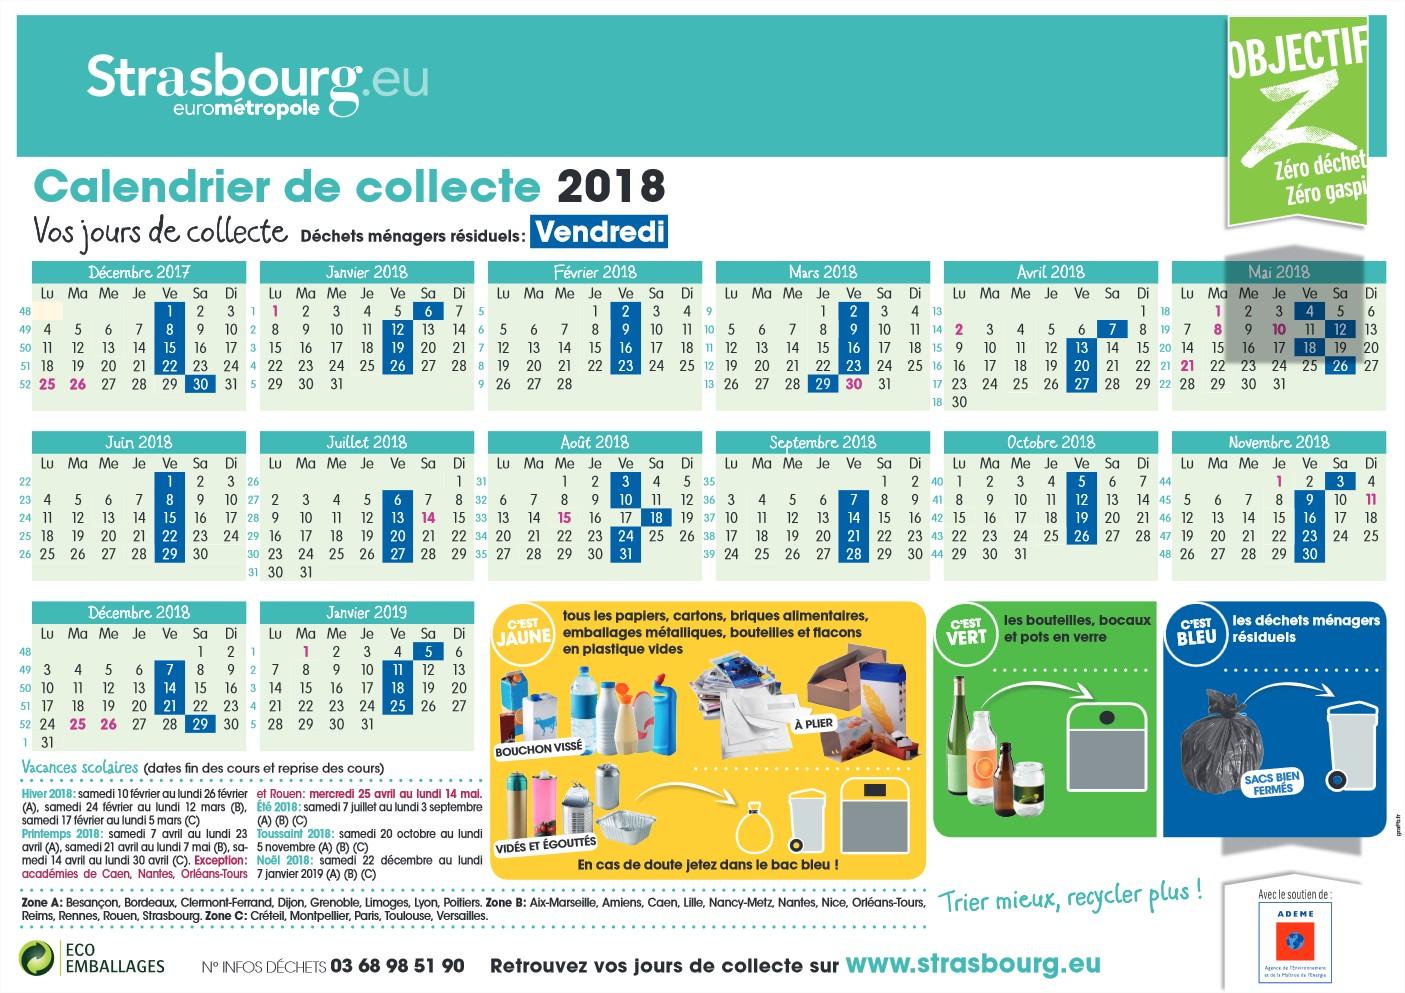 EMS calendrier collecte 2018